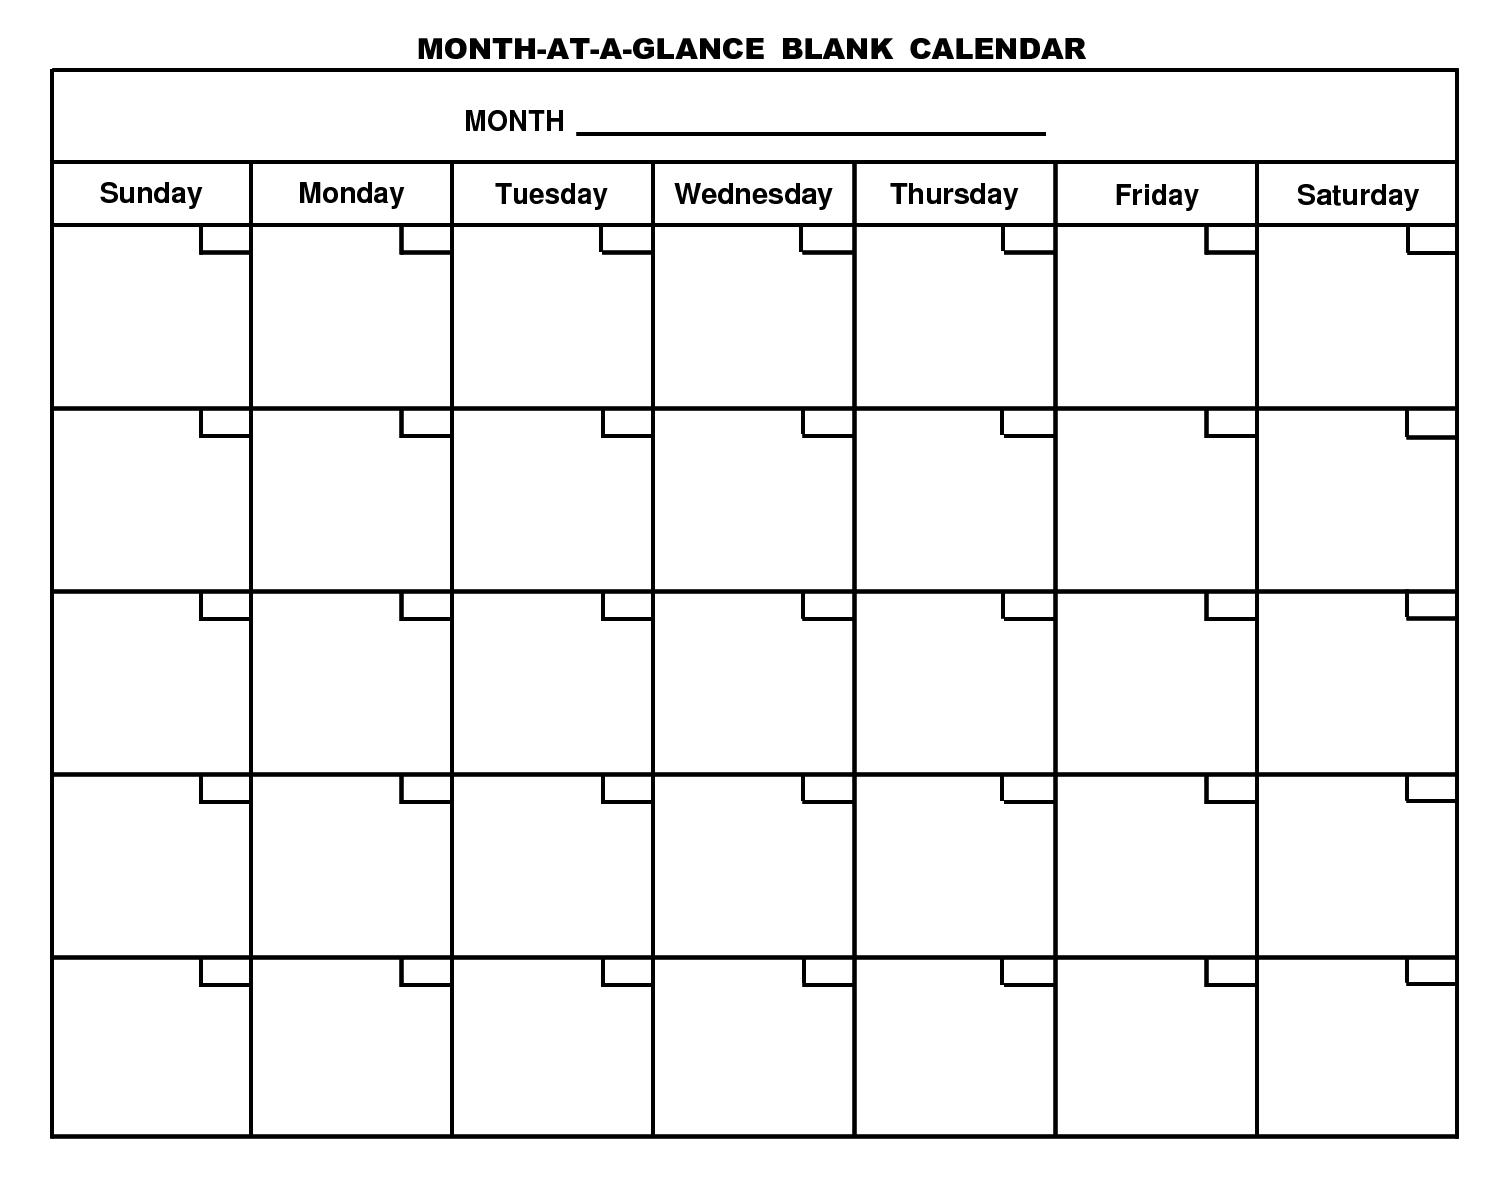 Printable Calendar To Fill In | Printable Calendar 2019 for Blank Calendar To Fill In